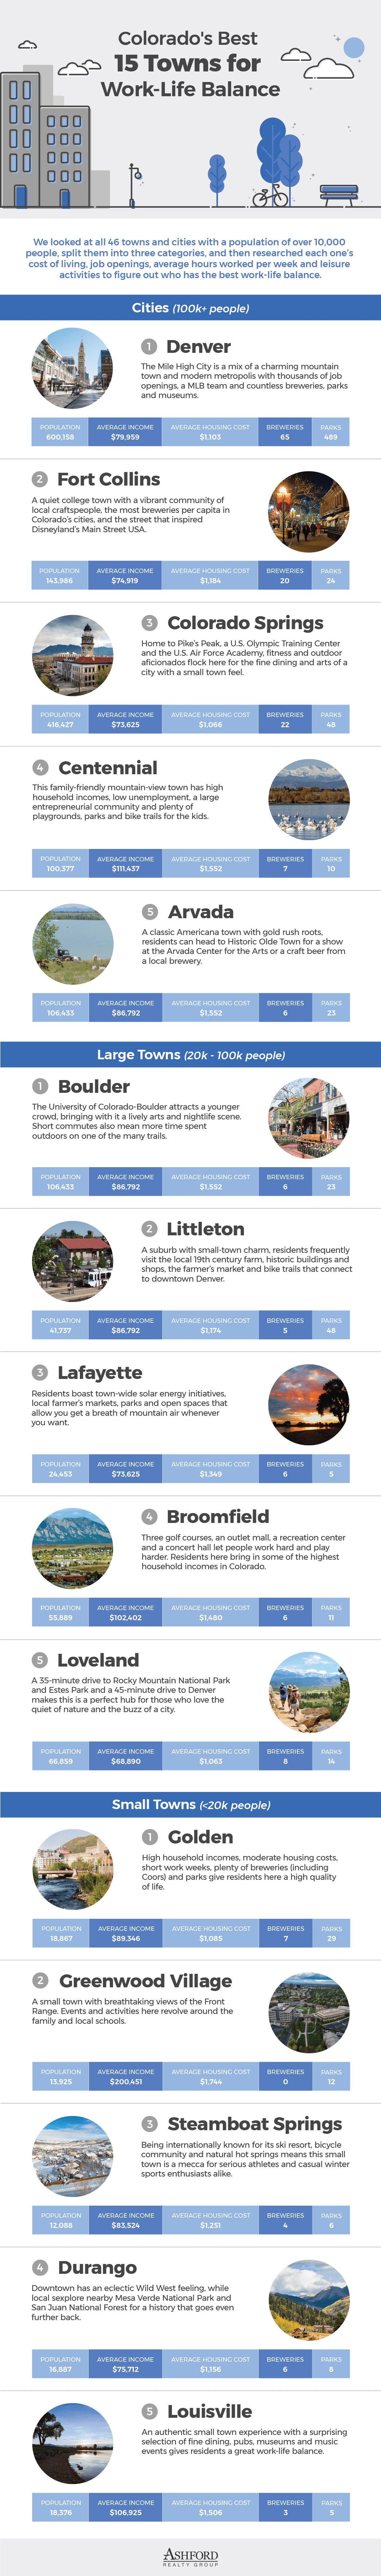 Colorado-city-study